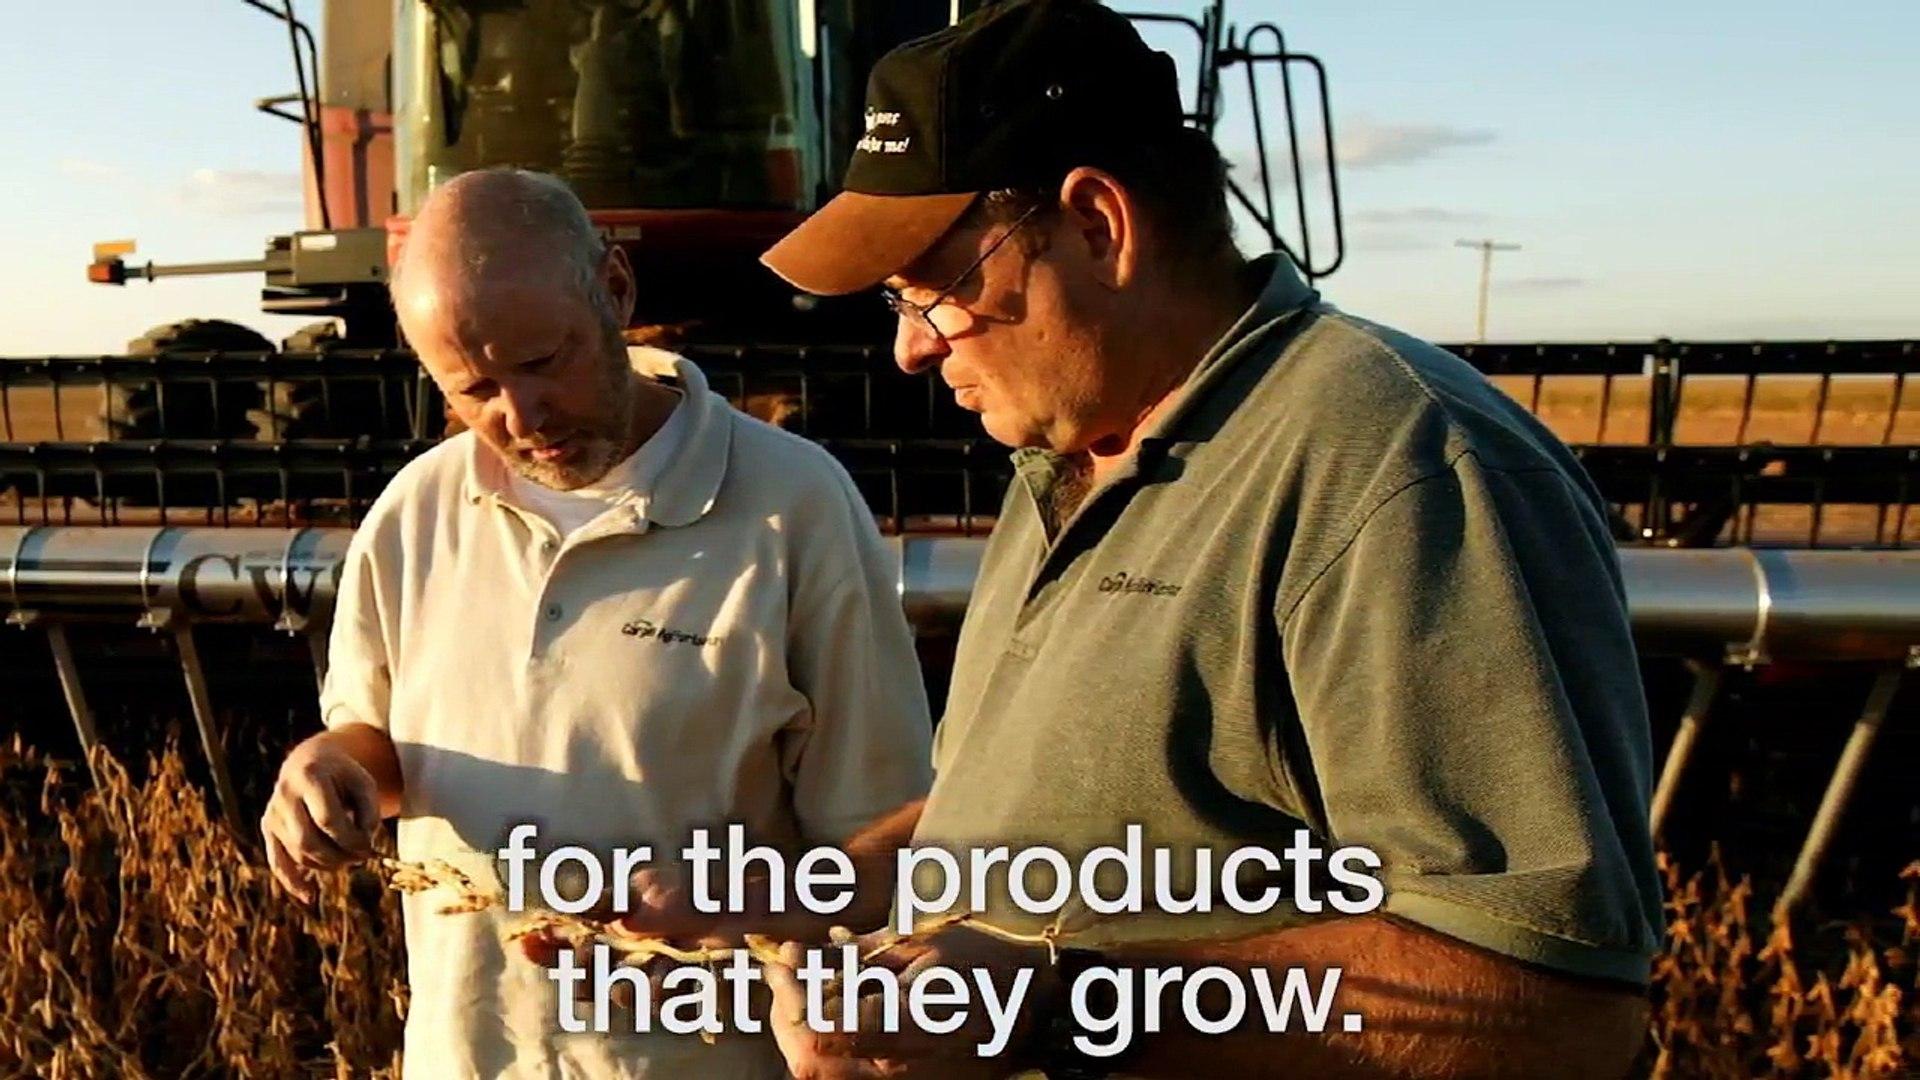 Cargill CEO: Why Global Trade Matters | Cargill